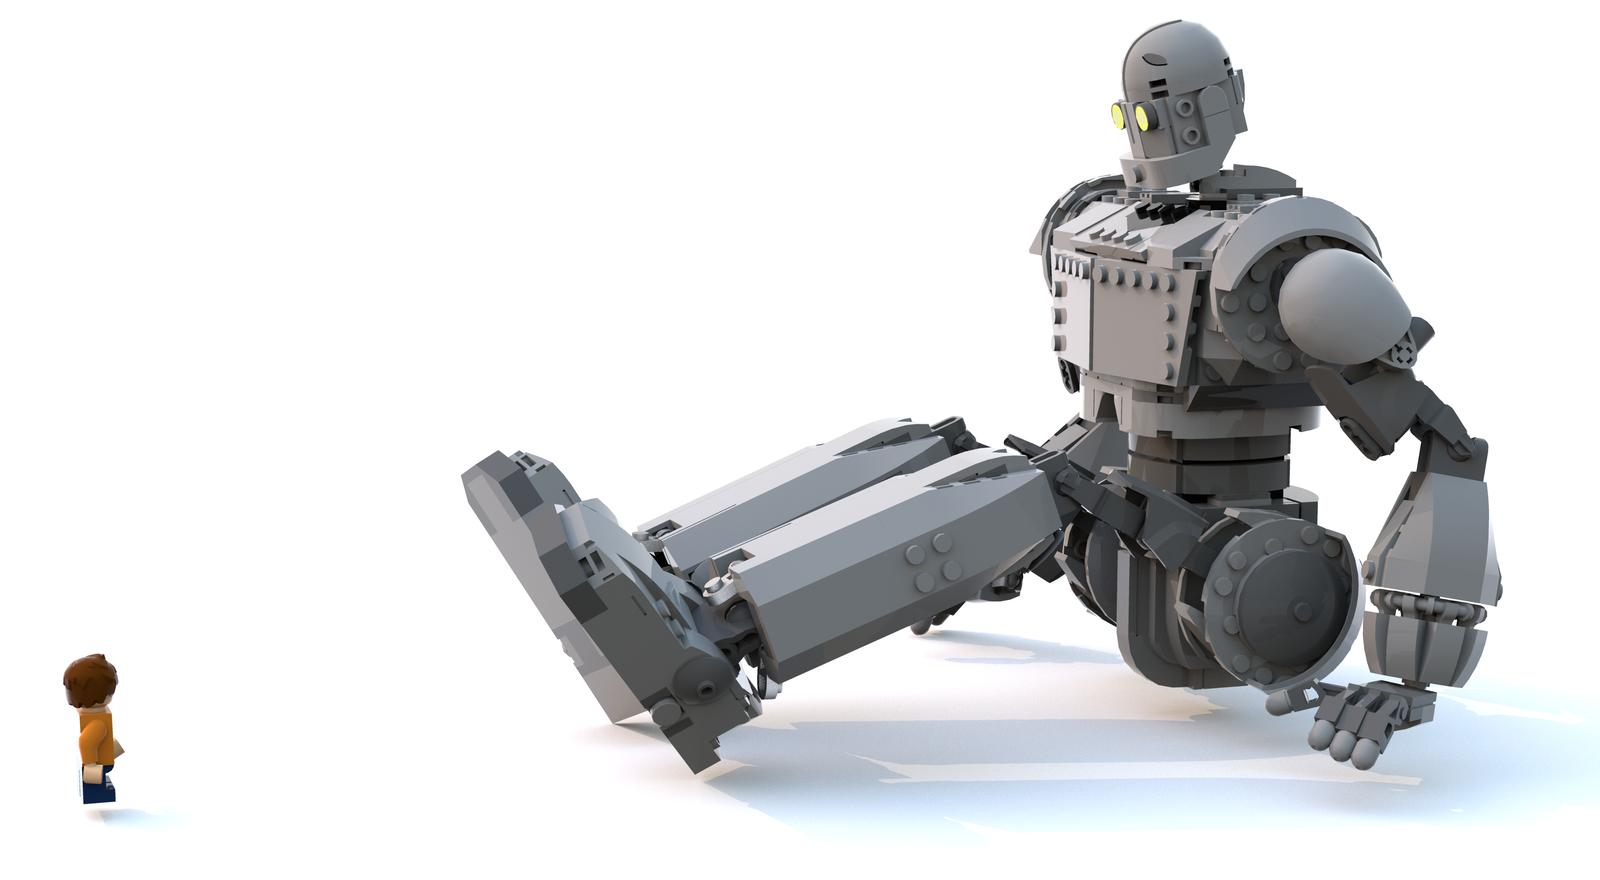 lego-ideas-the-iron-giant-20th-anniversary-edition-brettcuv-4 zusammengebaut.com